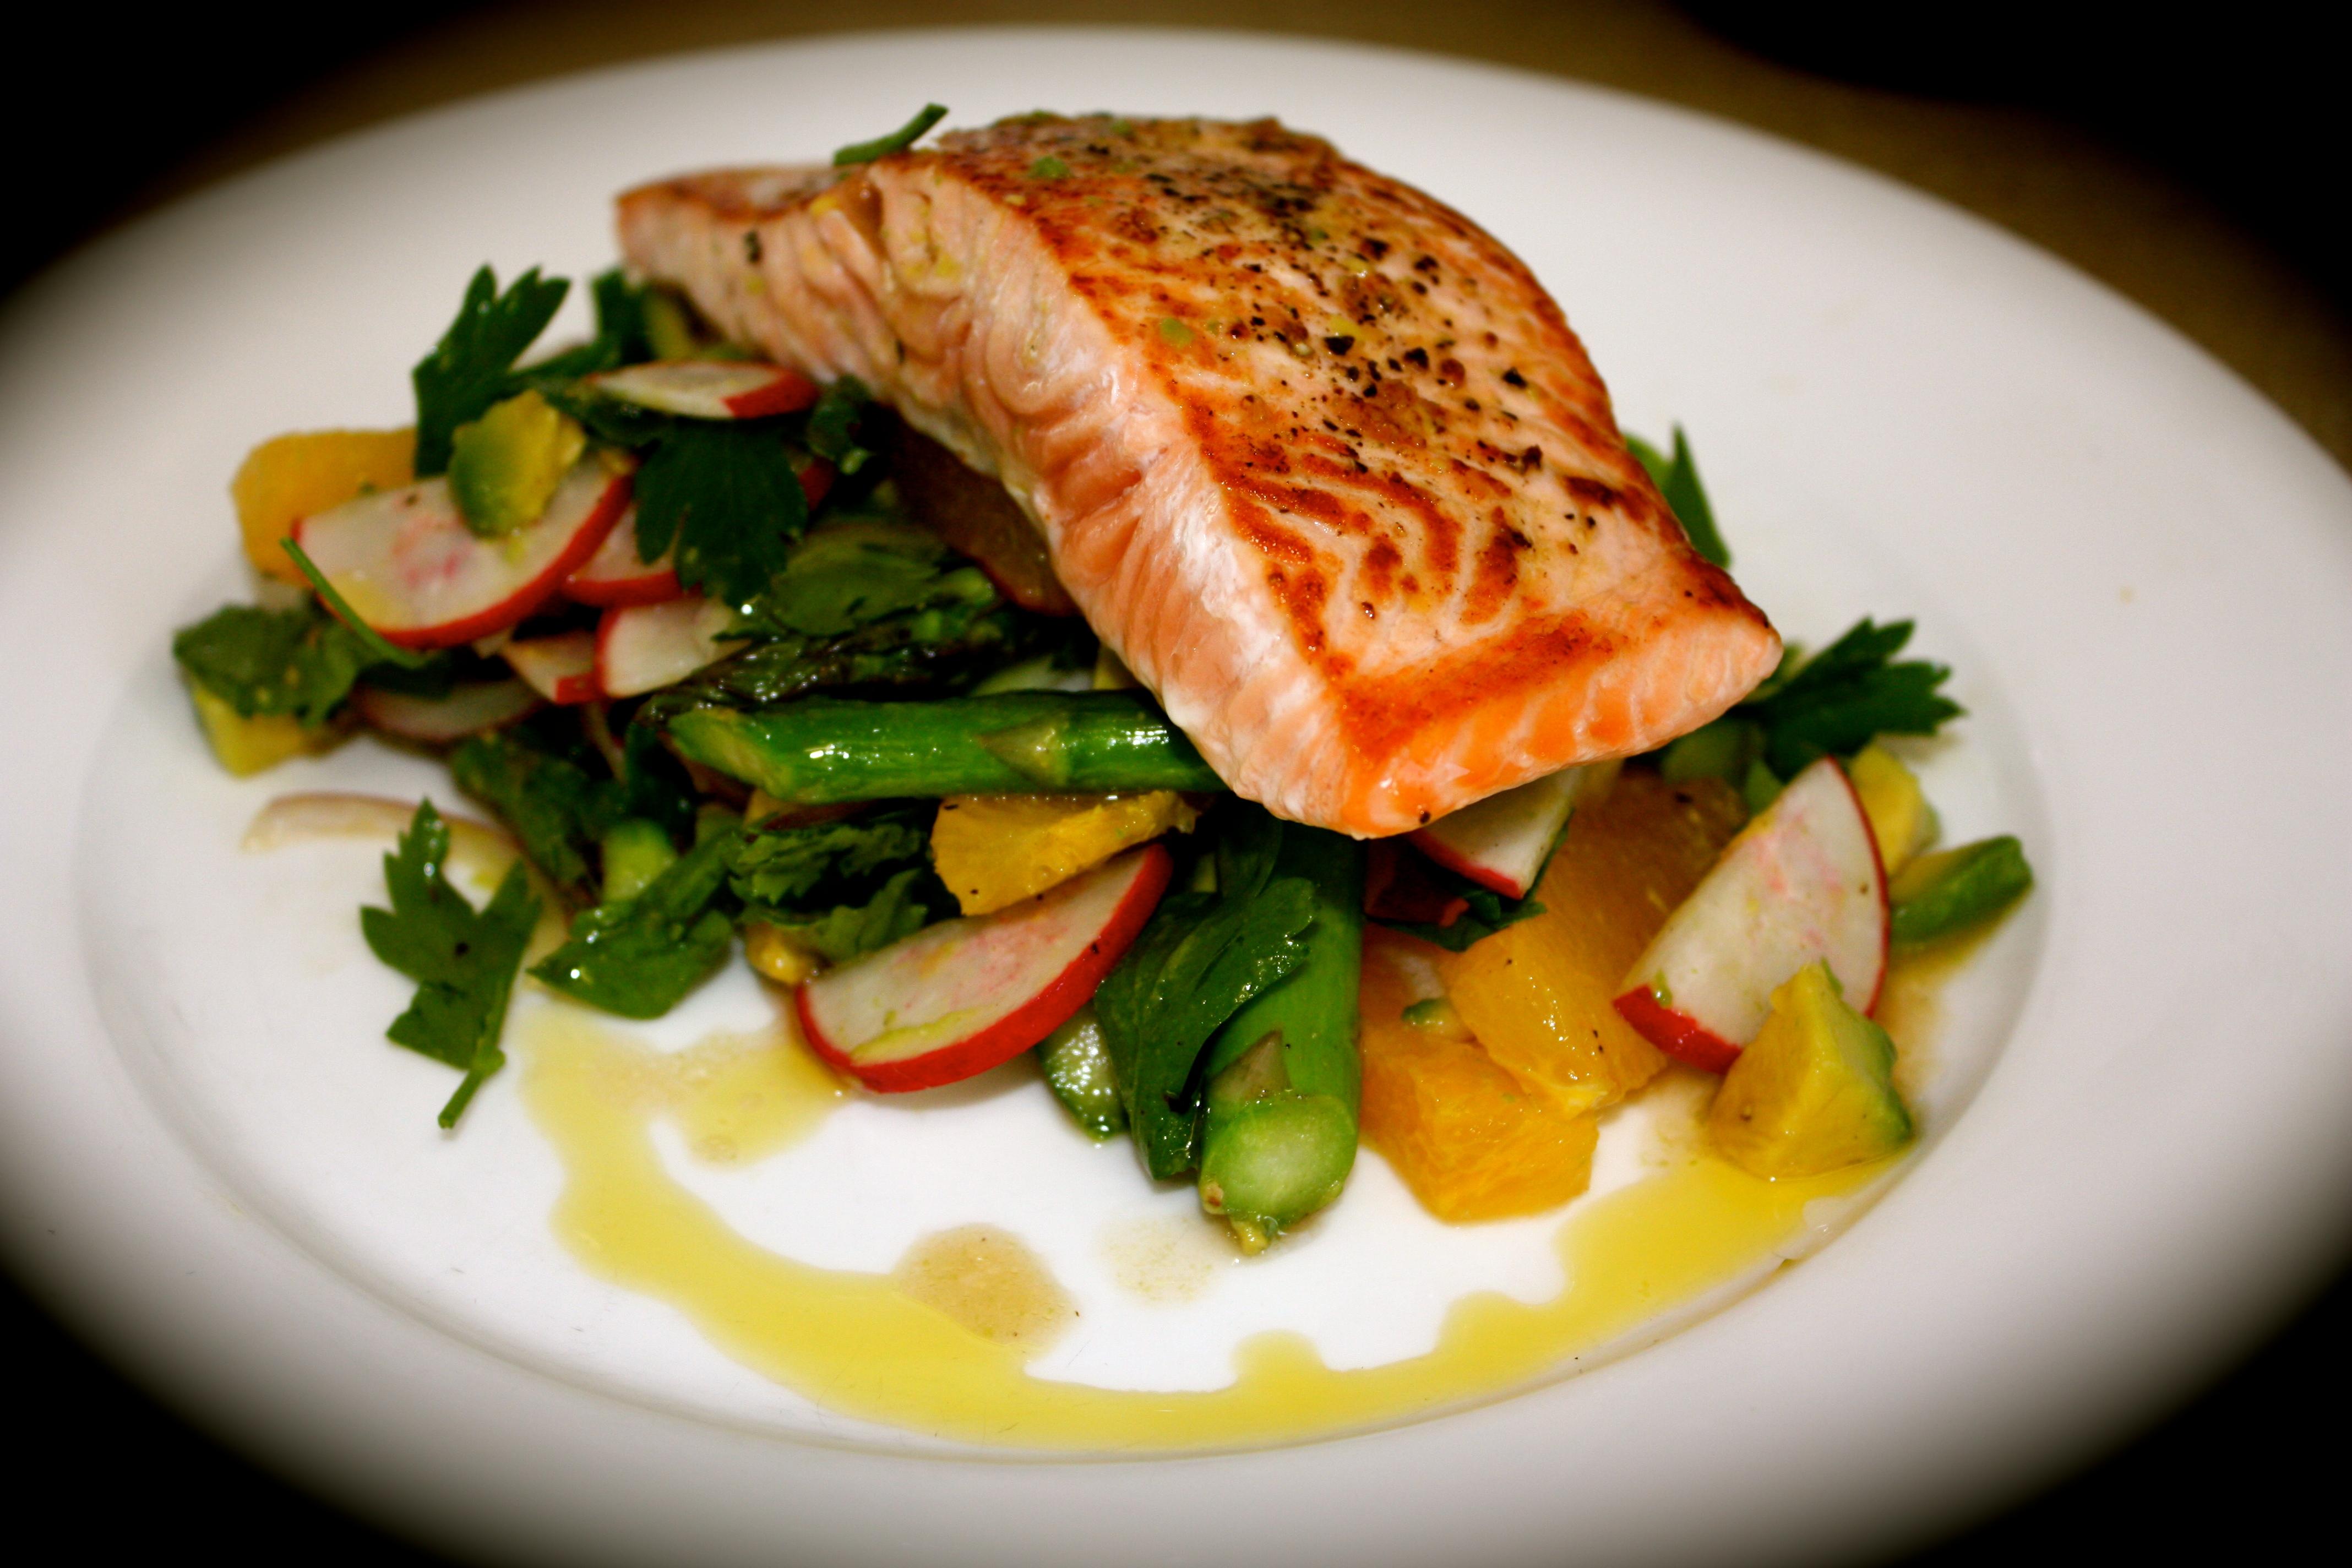 Seared Salmon with Warm Salad of Asparagus, Orange & Radish